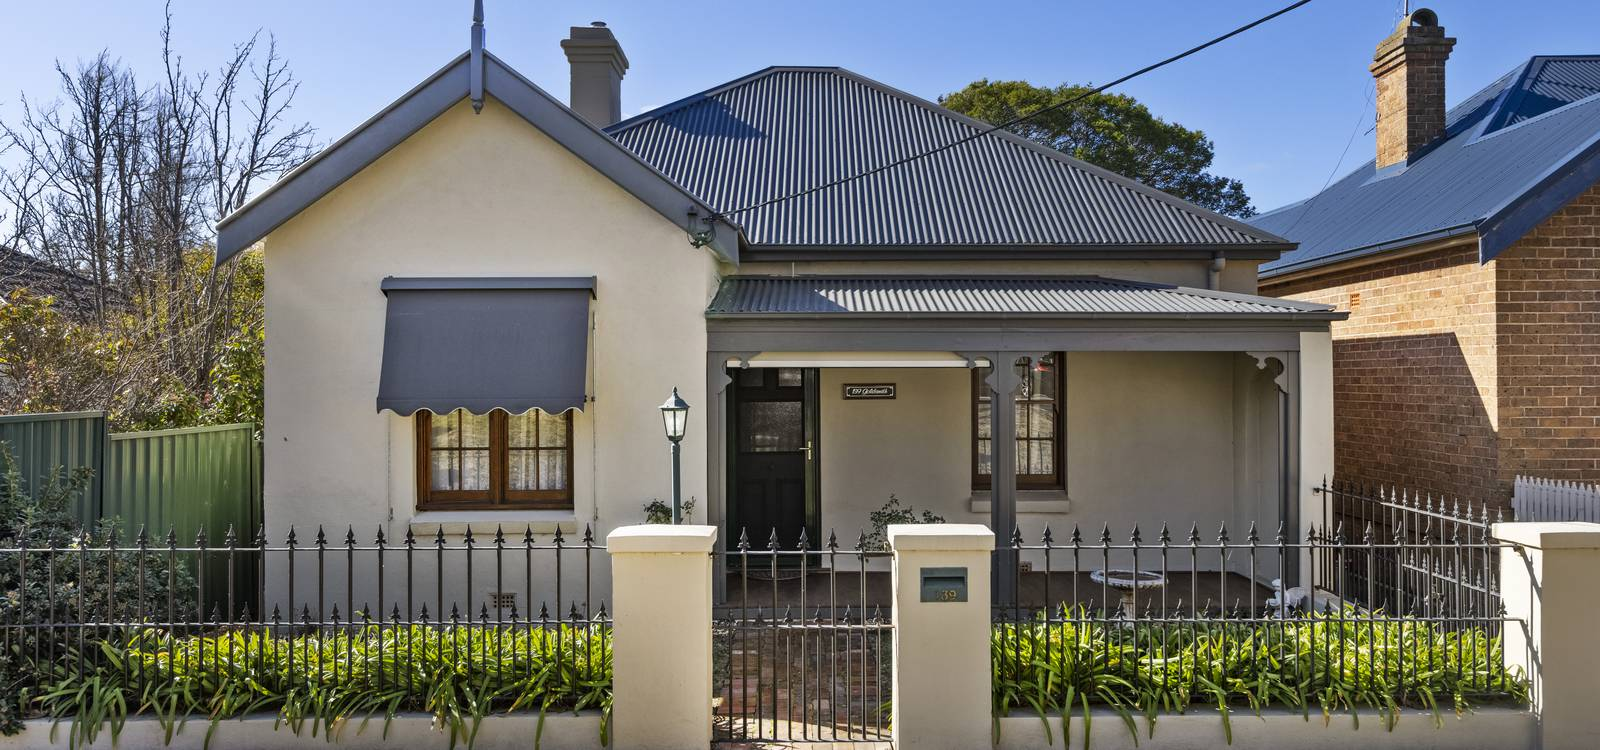 139 Goldsmith Street GOULBURN, NSW 2580 - photo 1